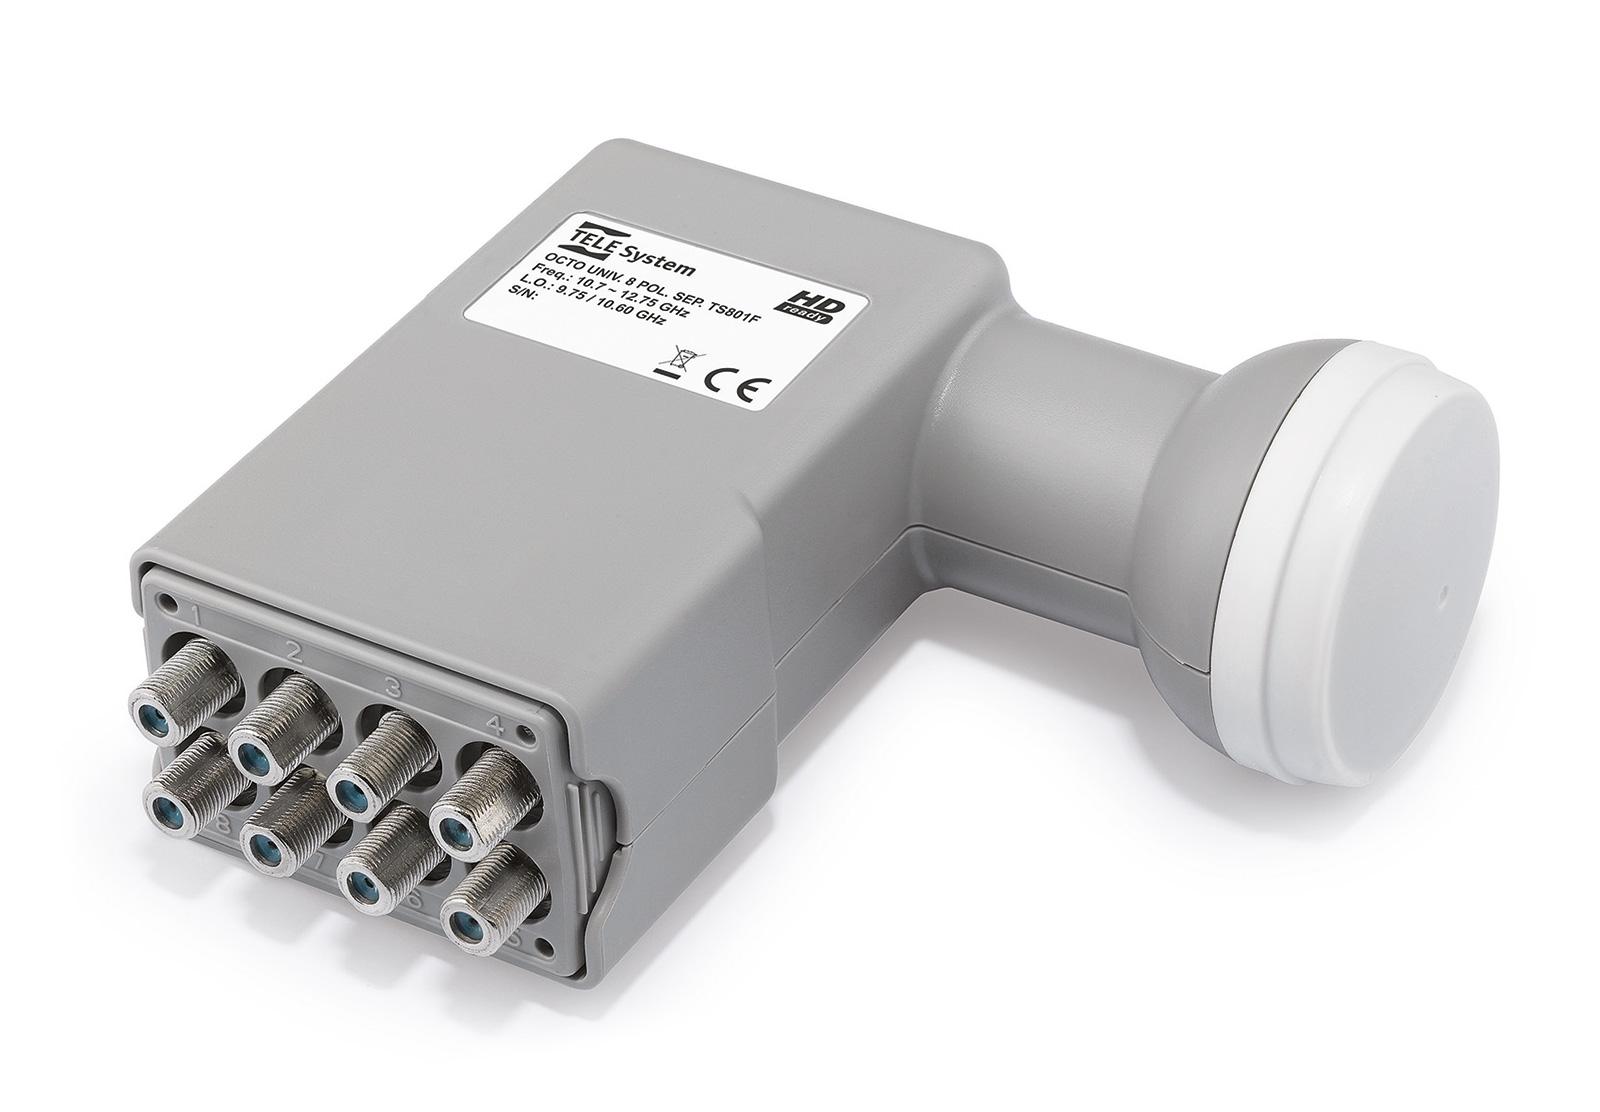 LNB TS801F